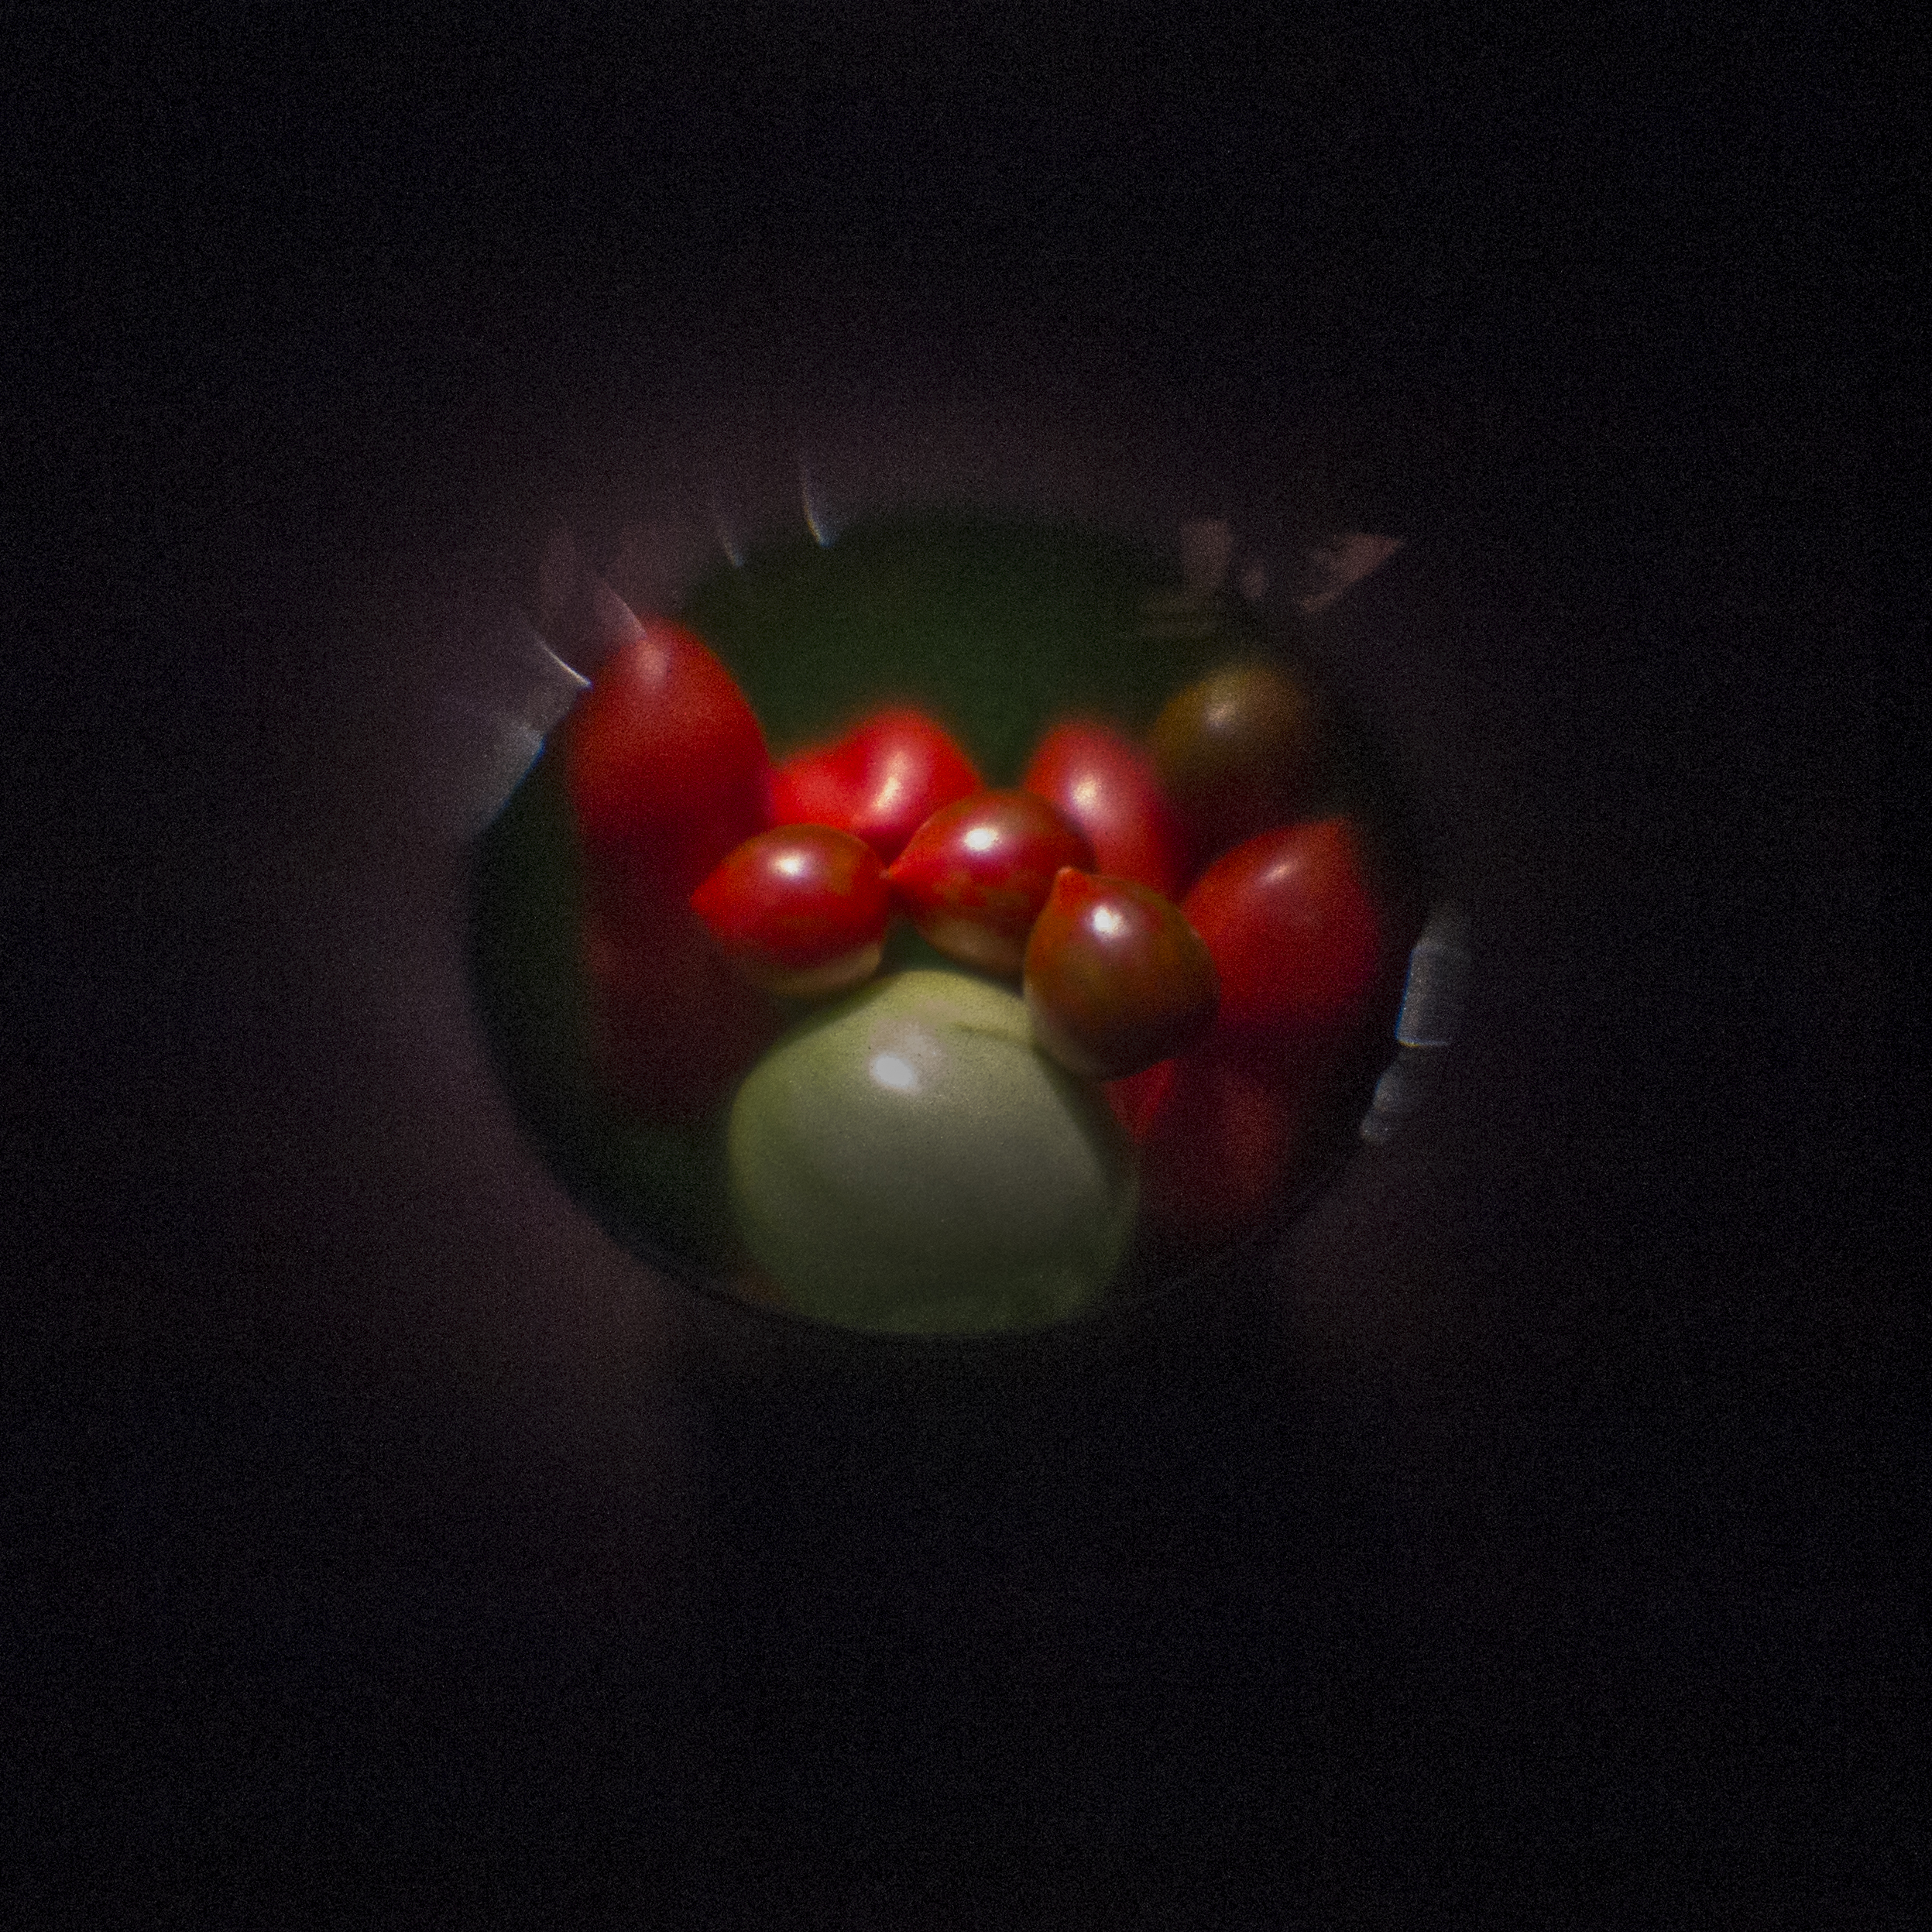 Tomatoes Fill Finnish Bowl